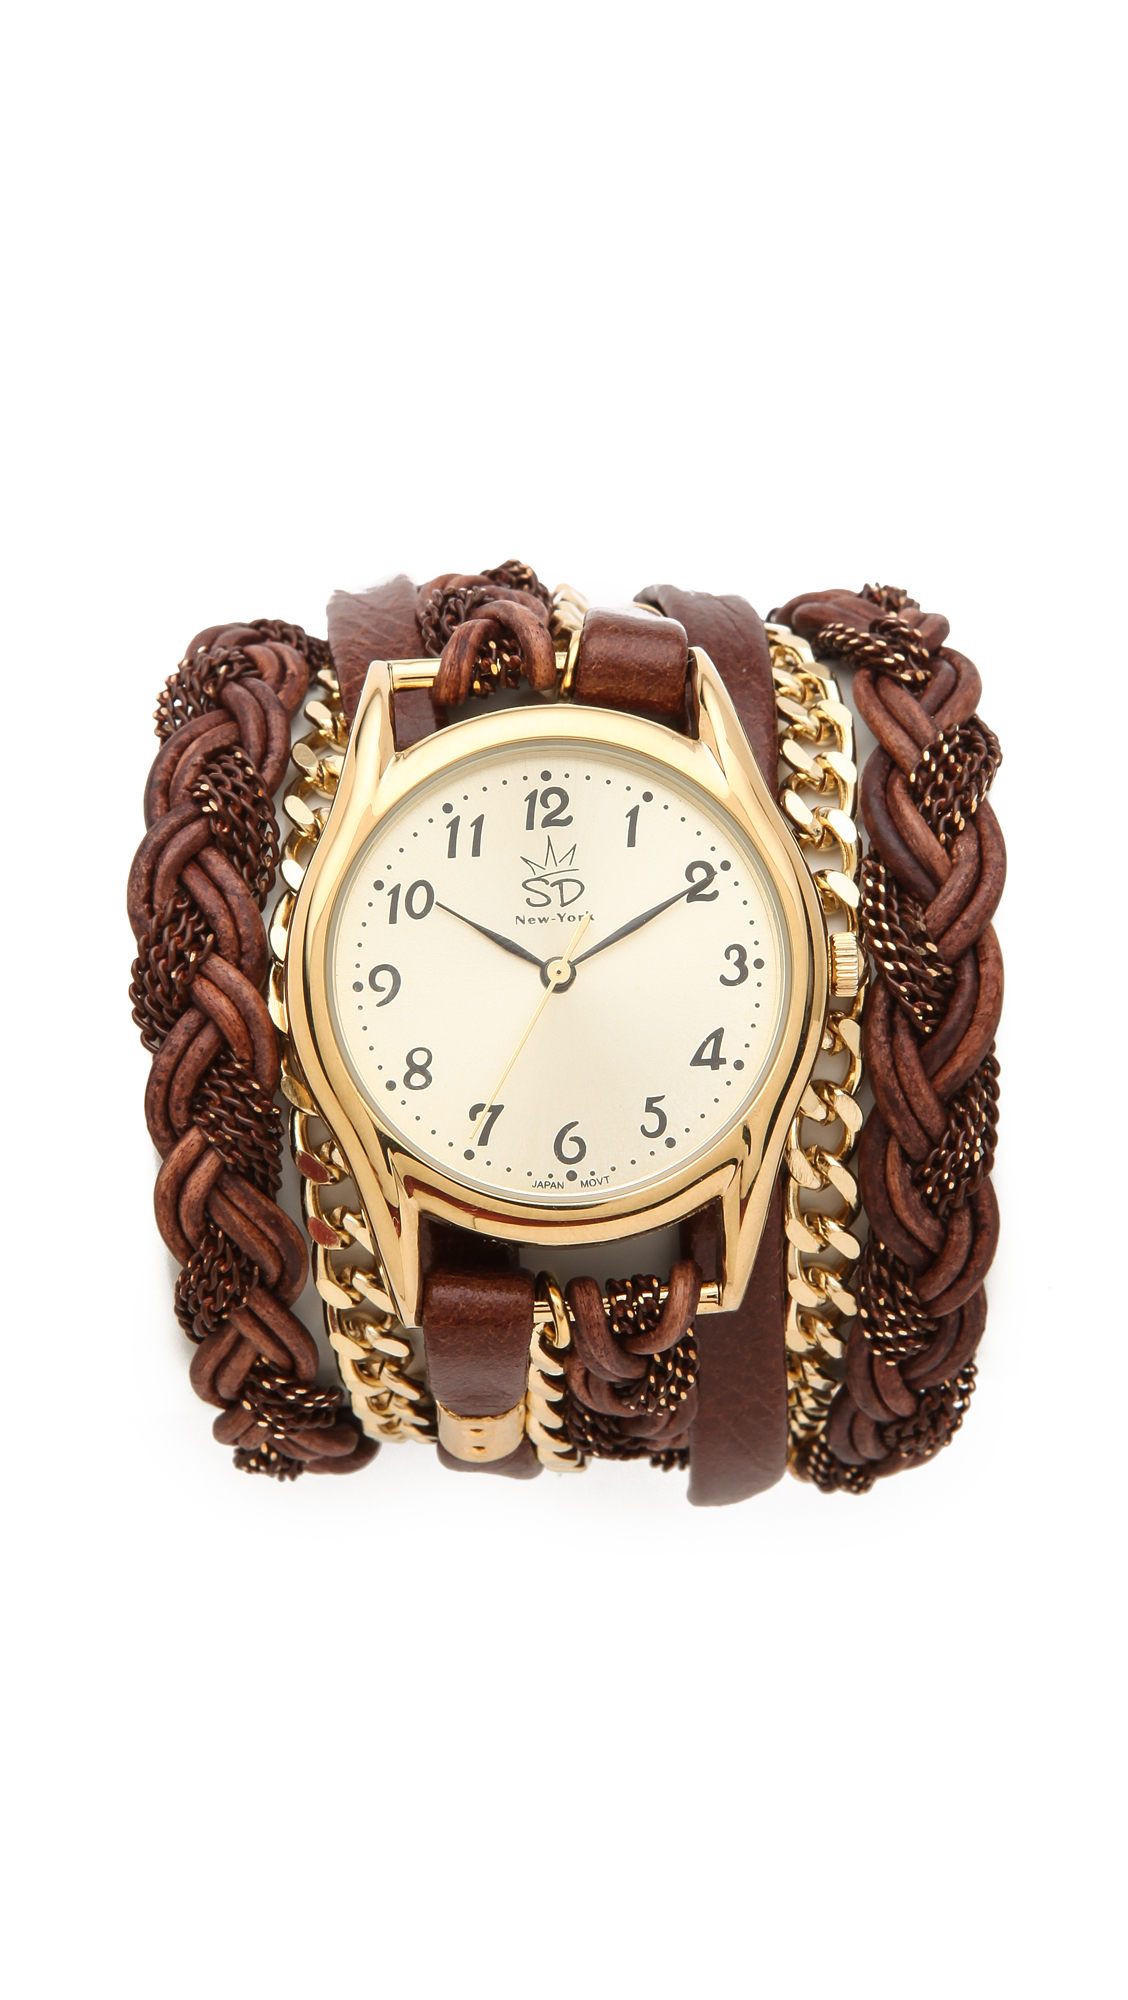 Lyst - Sara designs Leather Braid Chain Wrap Watch in Brown